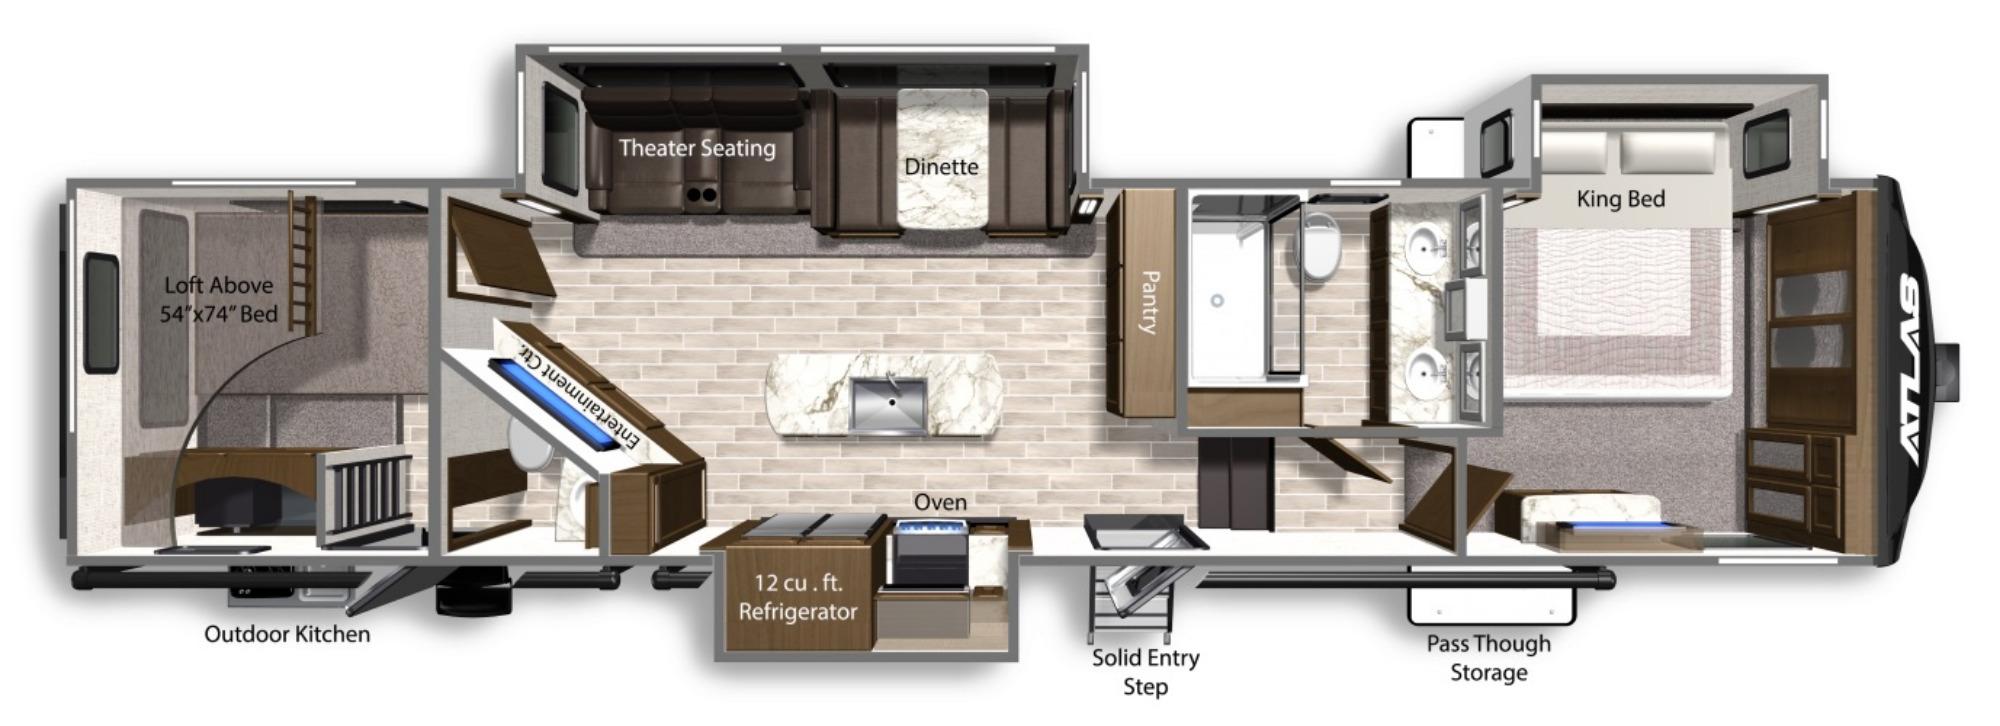 View Floor Plan for 2021 DUTCHMEN ATLAS 3602LFKB